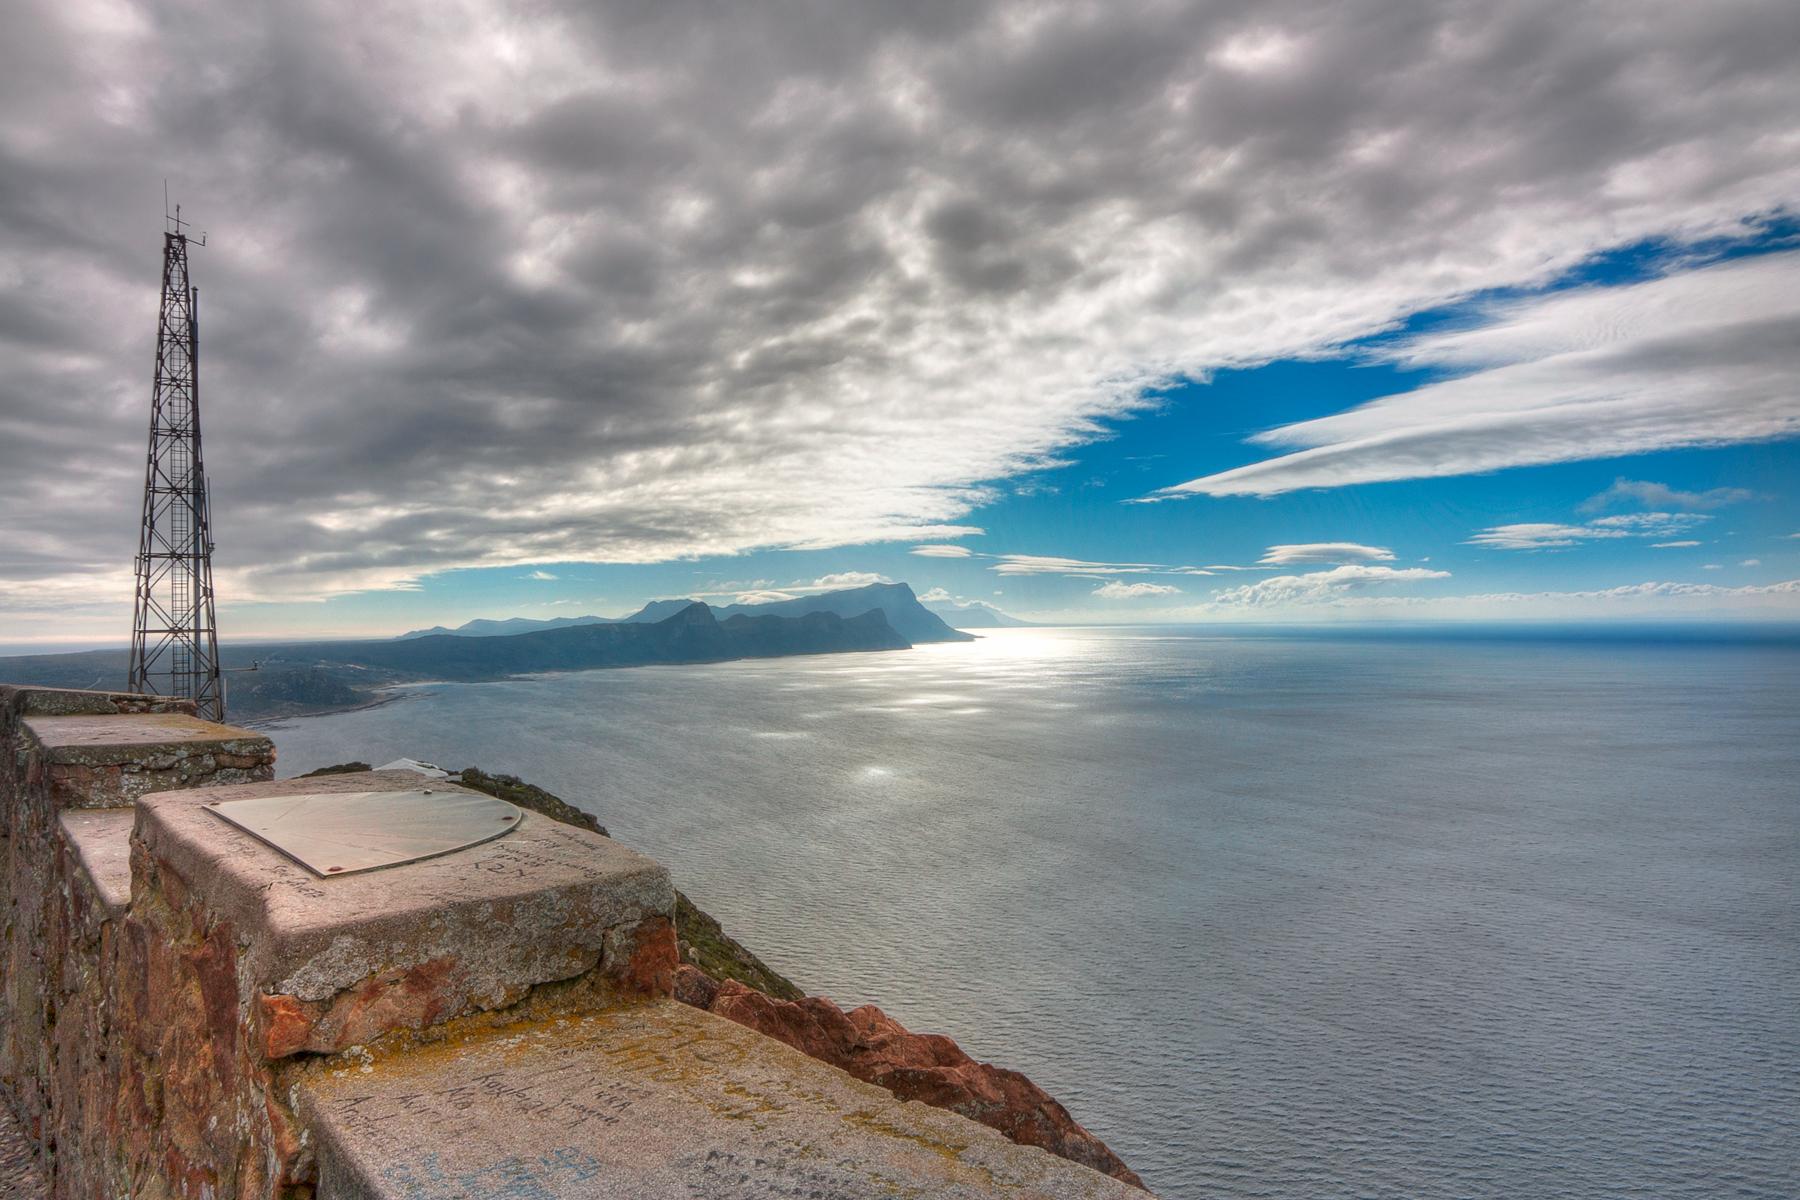 Cape Point Coastal Scenery - HDR, Africa, Resource, Seascape, Sea, HQ Photo